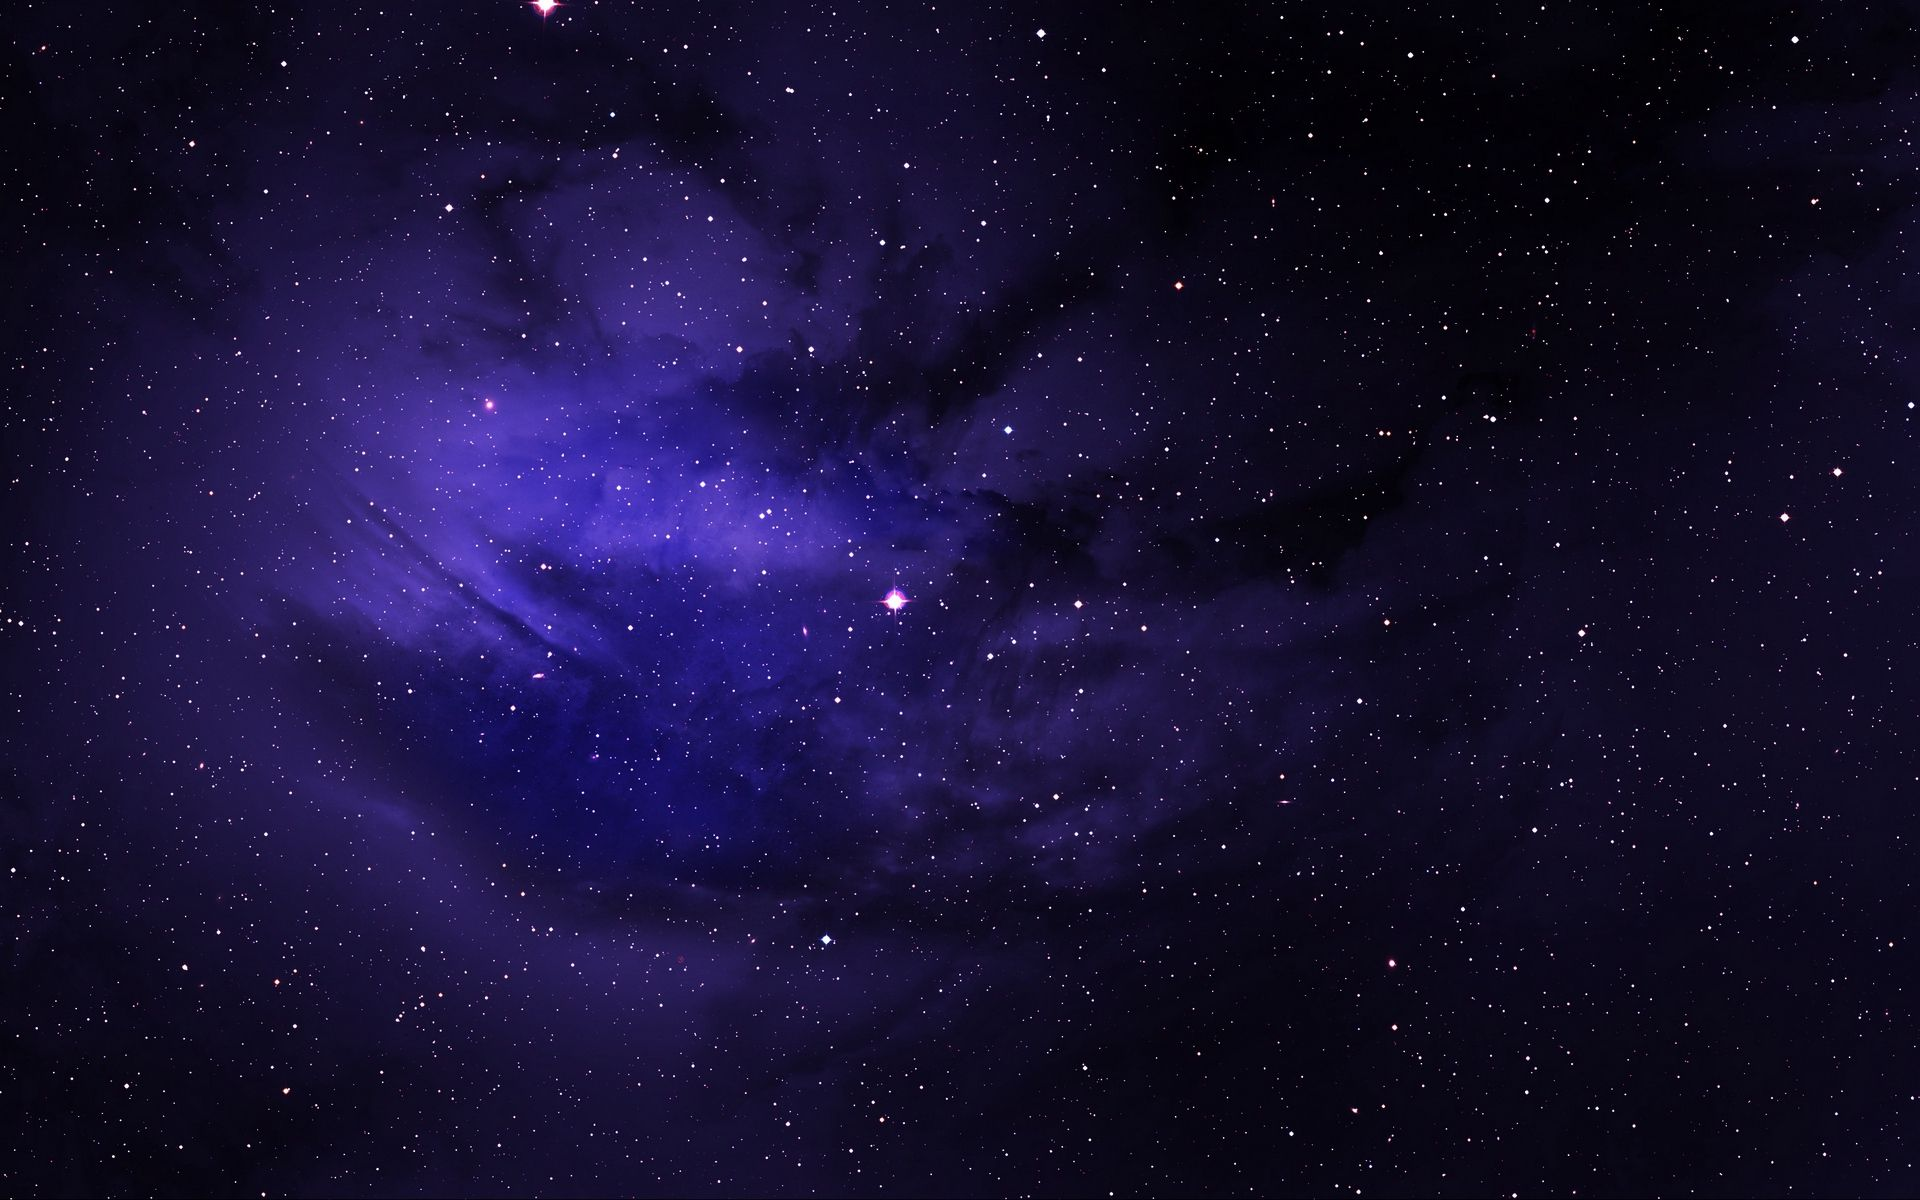 Dark Space Wallpaper Hd Galaxy Wallpaper Galaxy Purple Sky